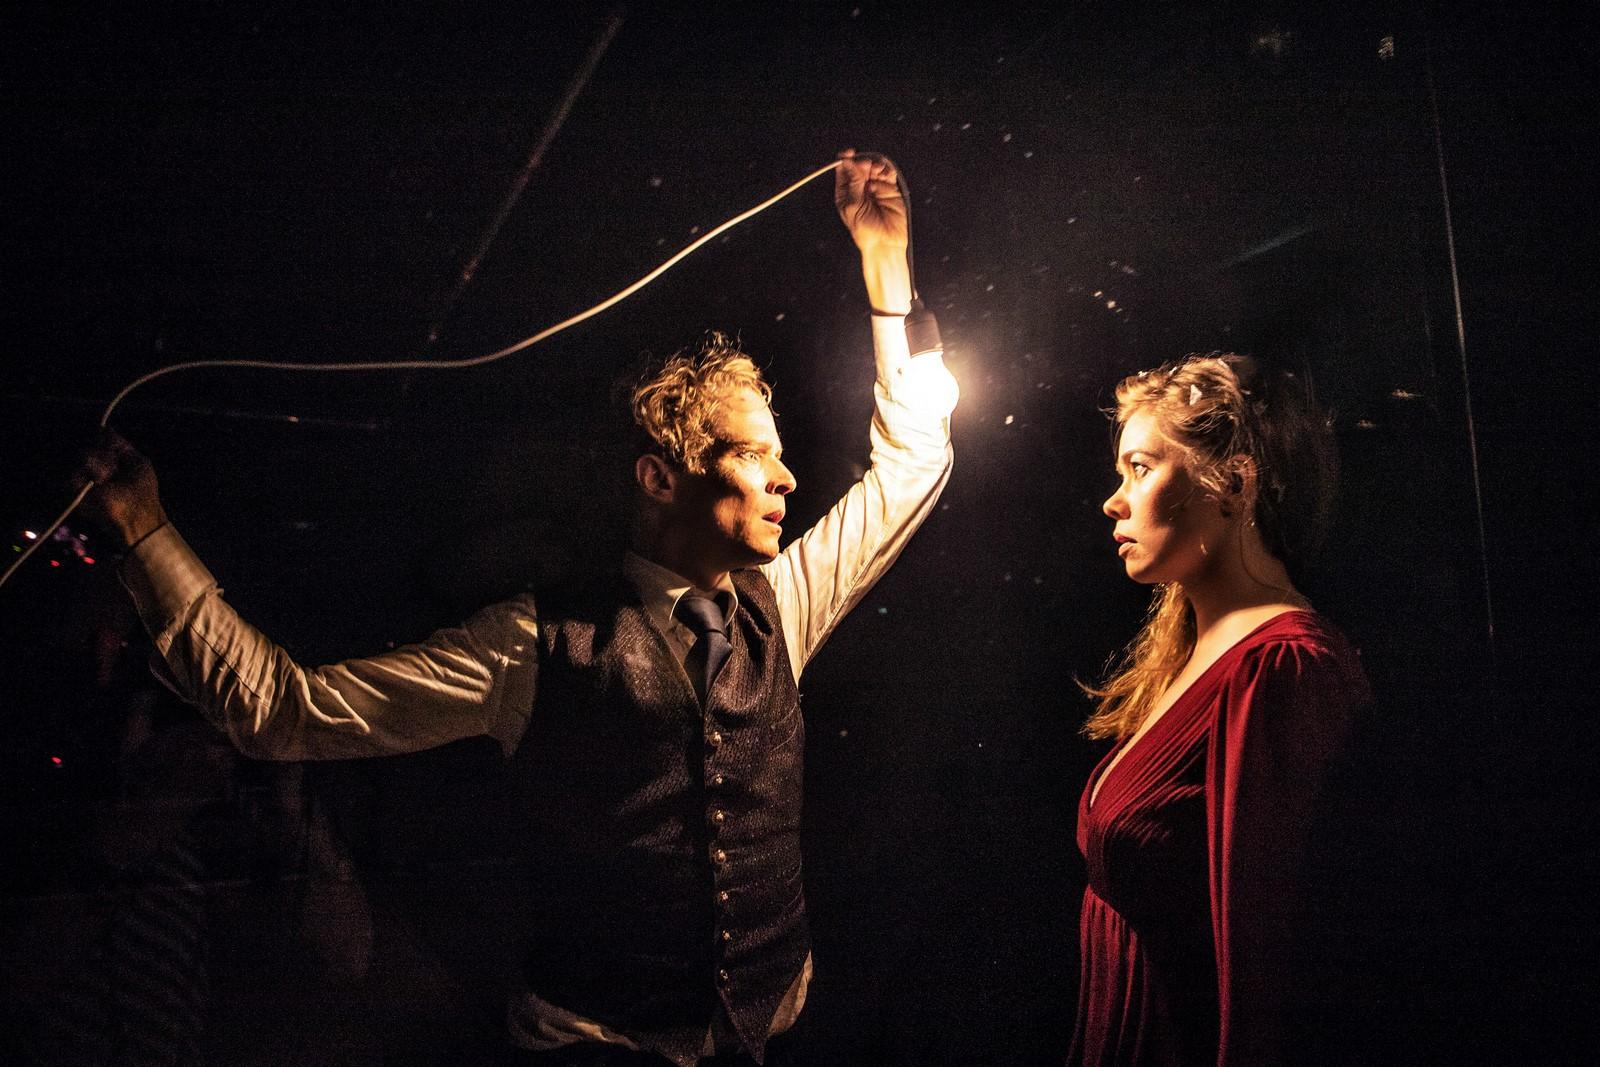 Anmeldelse: Et vintereventyr, Østerbro Teater, Republique